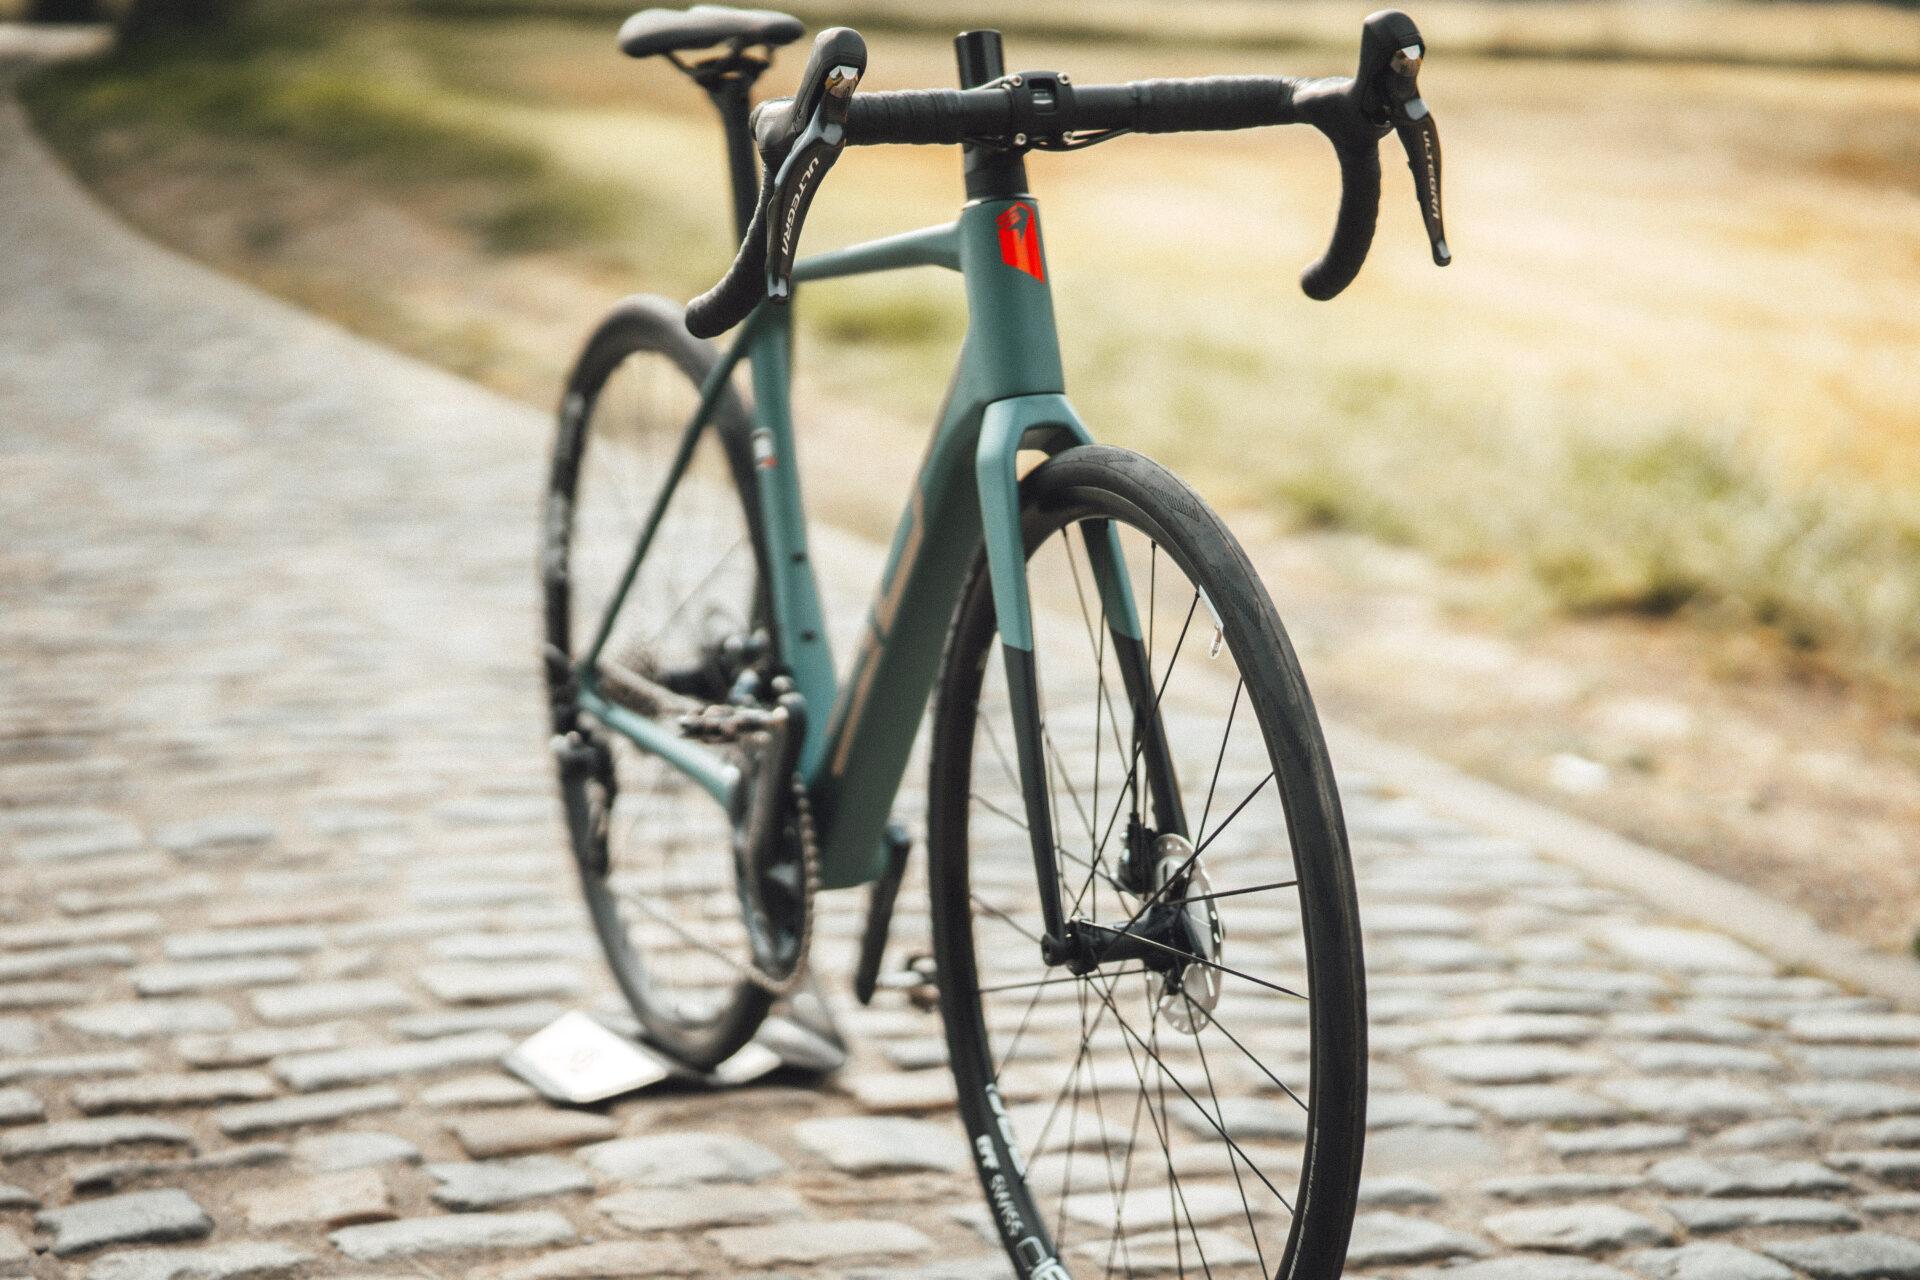 Superior bikes X-road Team Issue Matte Trooper